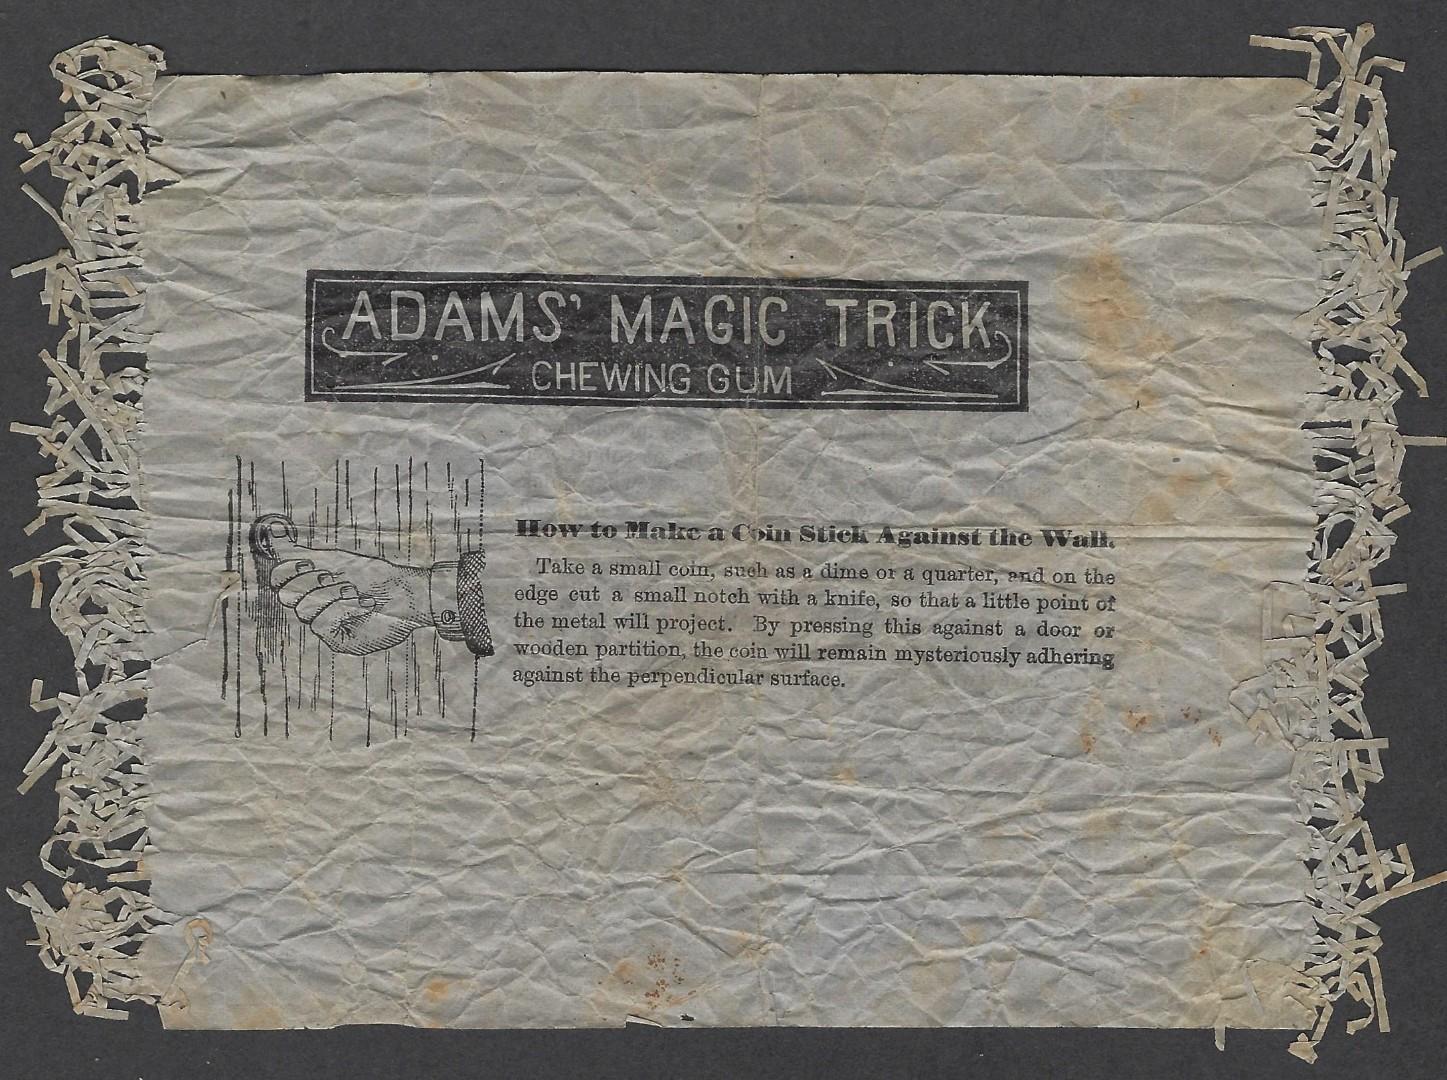 Adams Magic Trick 6.jpg